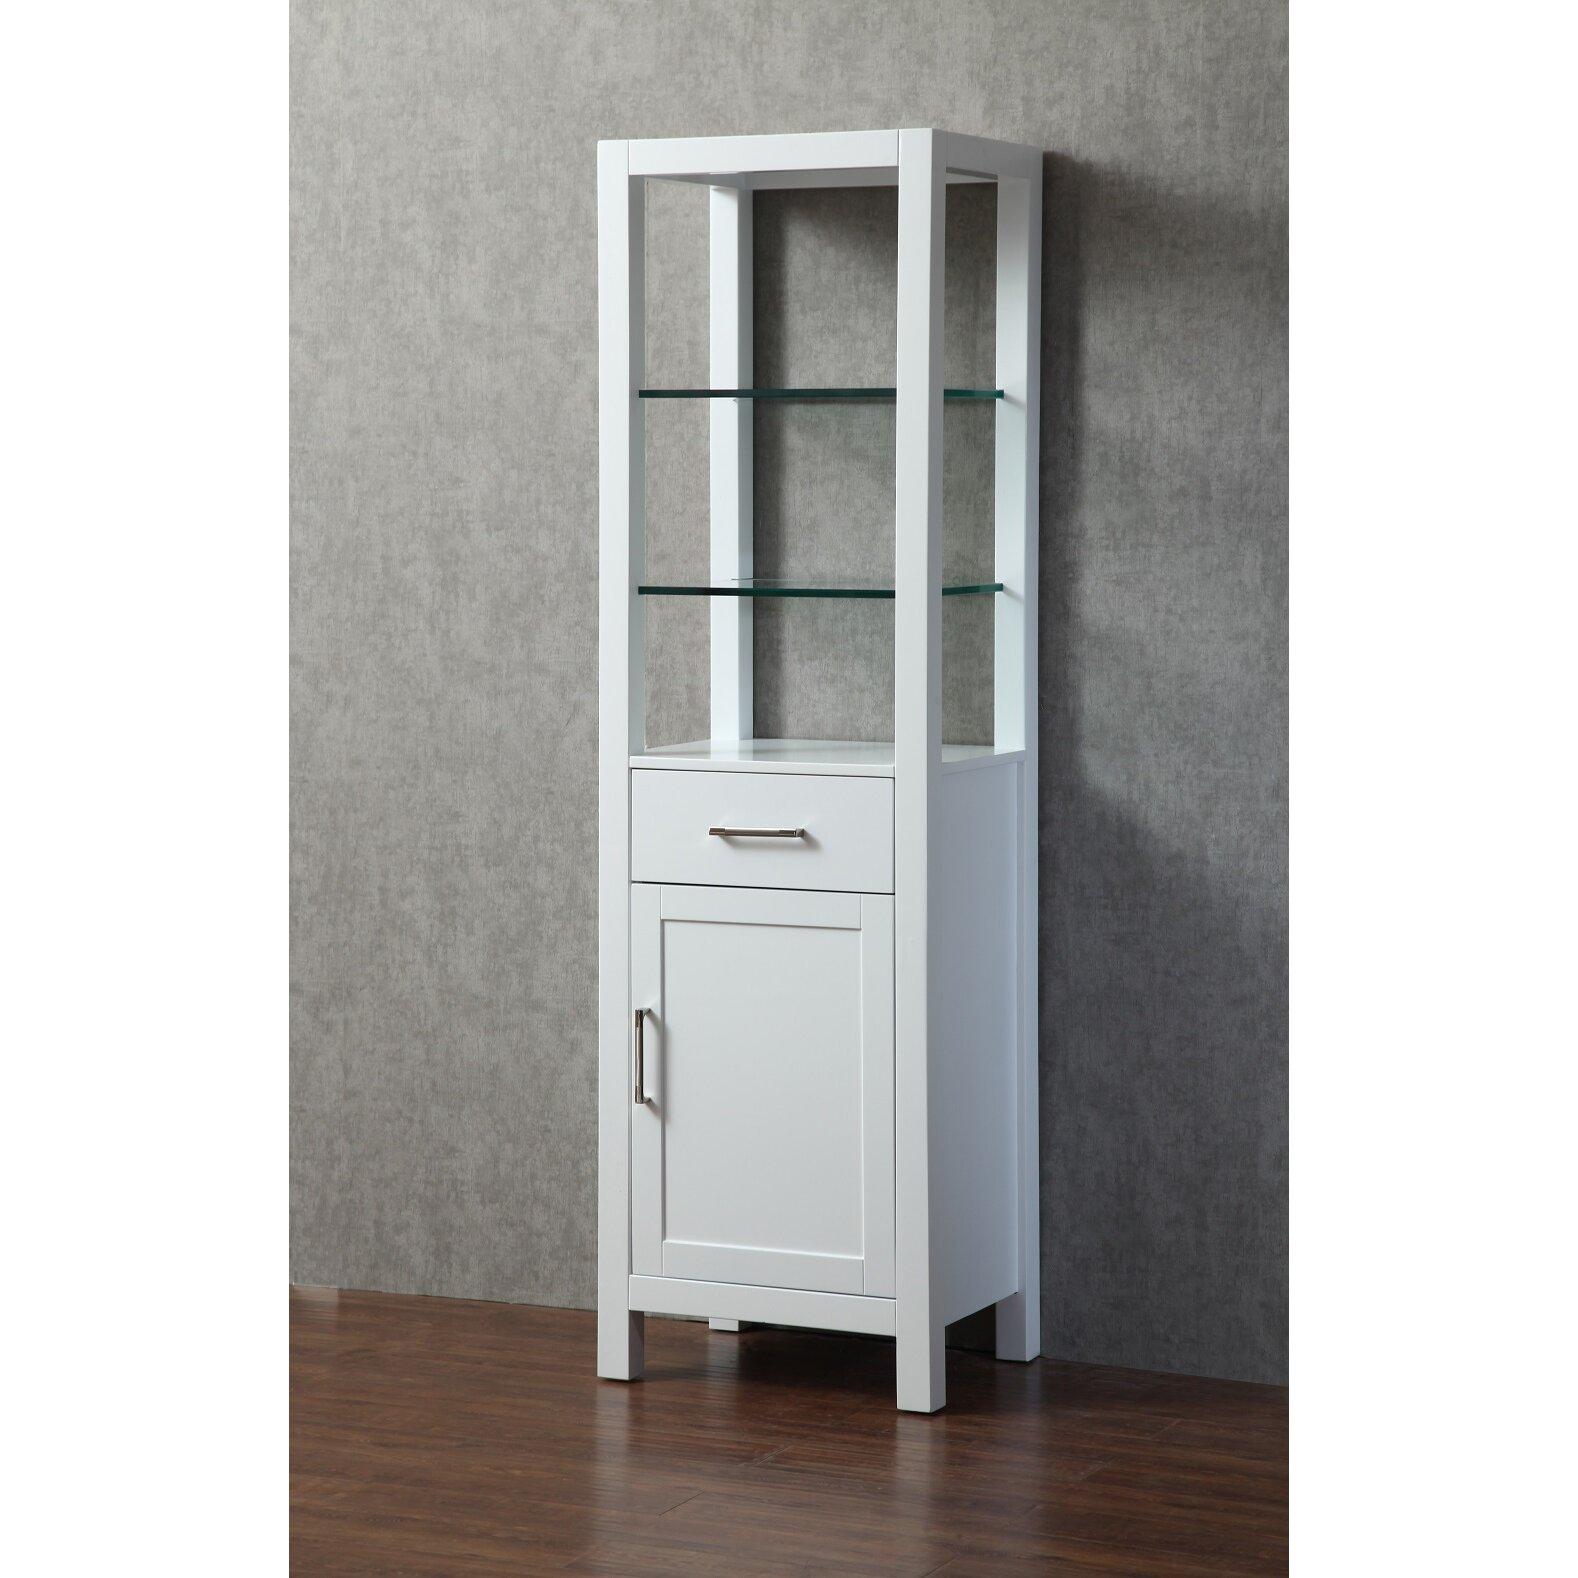 Dcor design kenya 20 w x 70 h linen tower for Bathroom design kenya